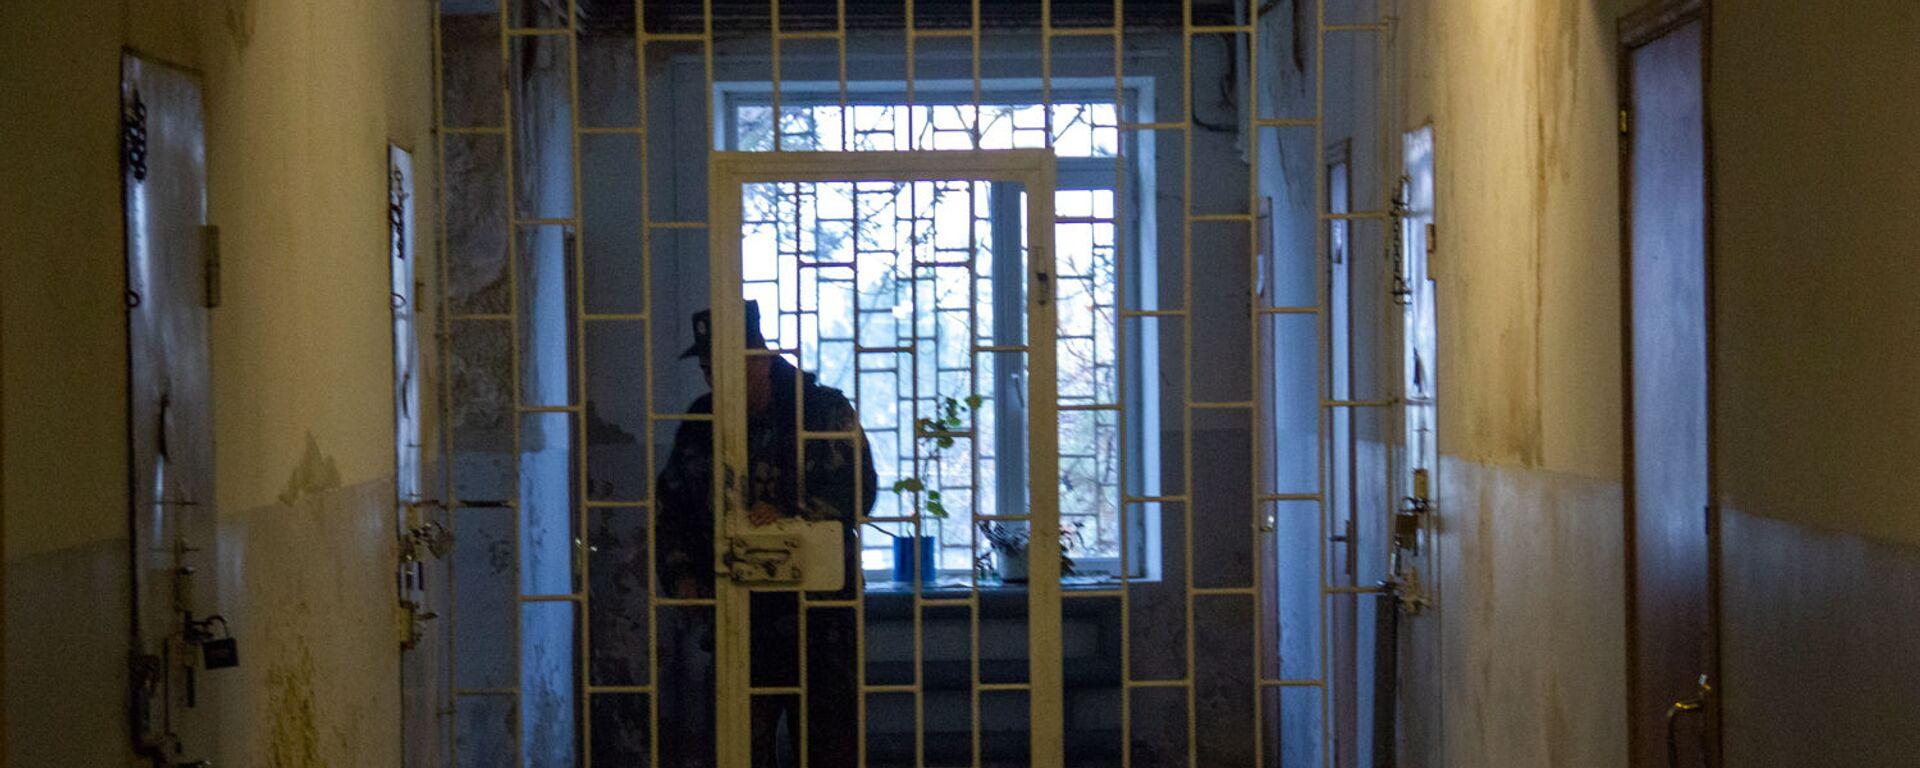 Женская тюрьма - Sputnik Արմենիա, 1920, 20.06.2021